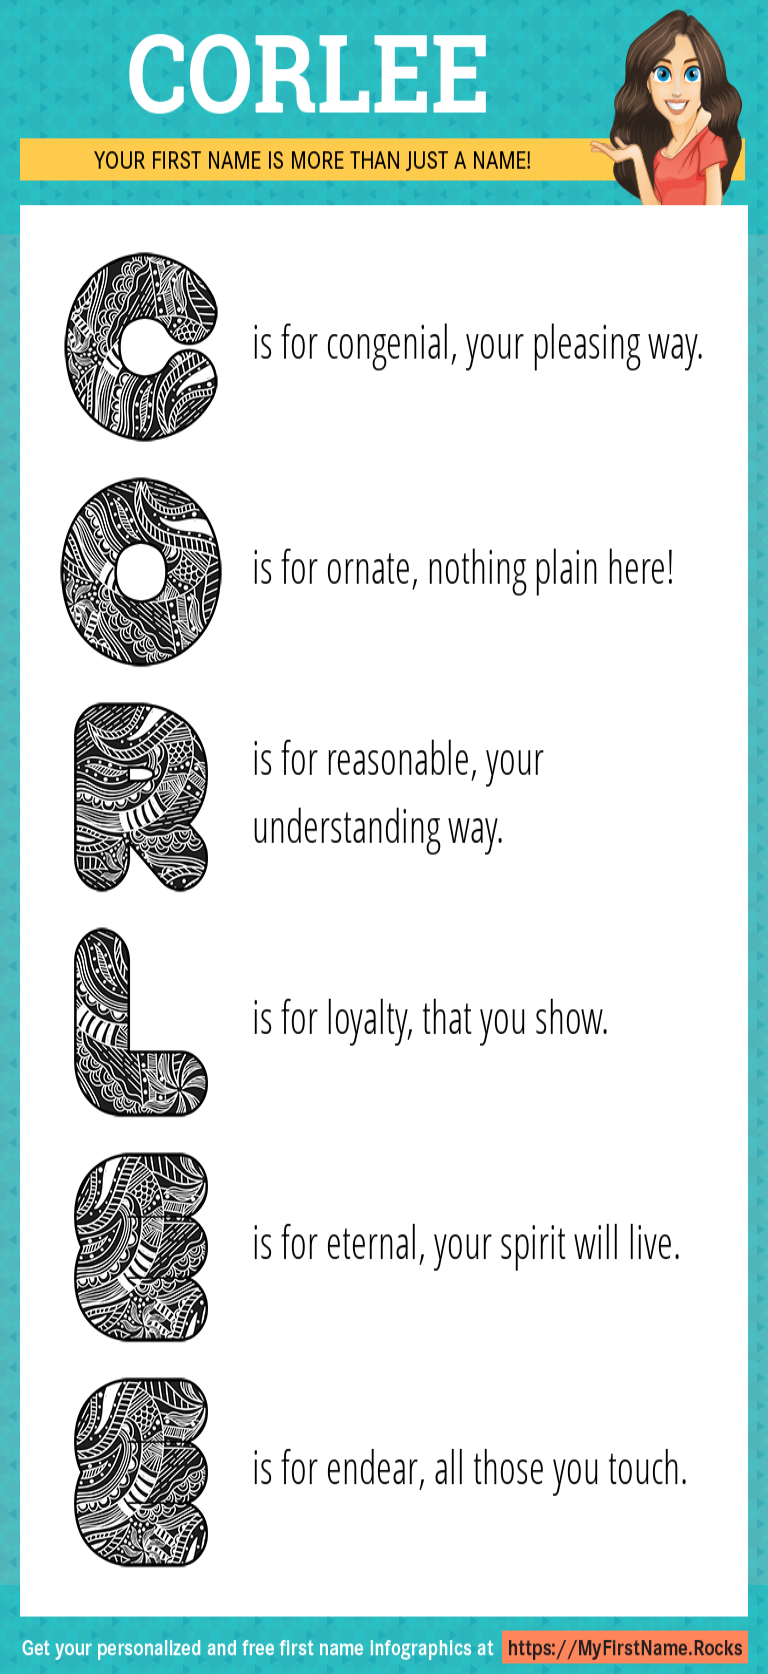 Corlee Infographics